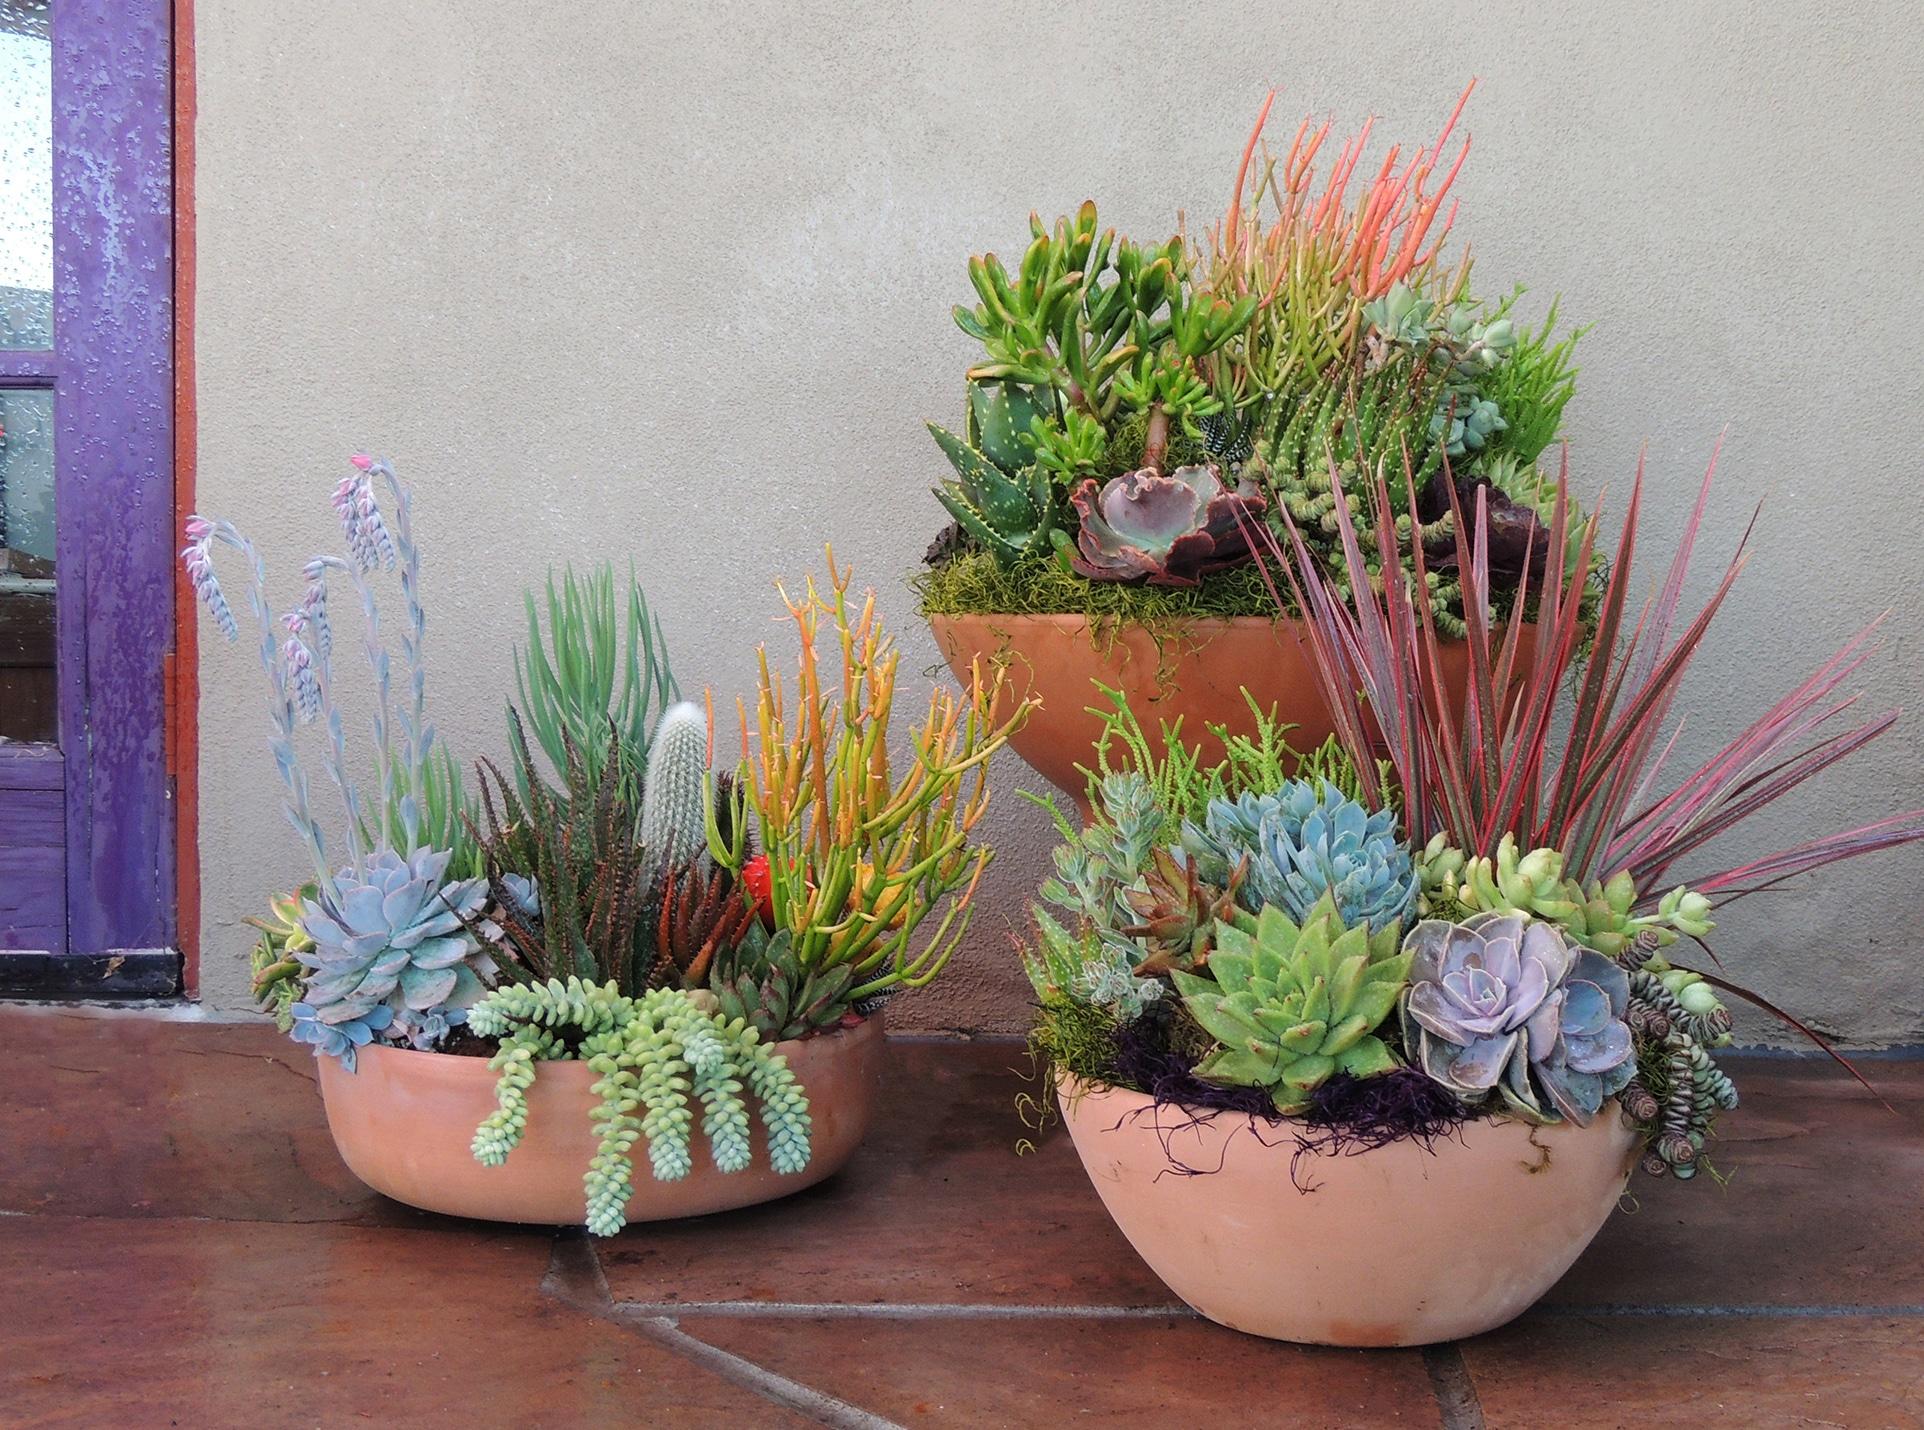 Succulent Garden In Terracotta Pot For Patio Urban Succulents